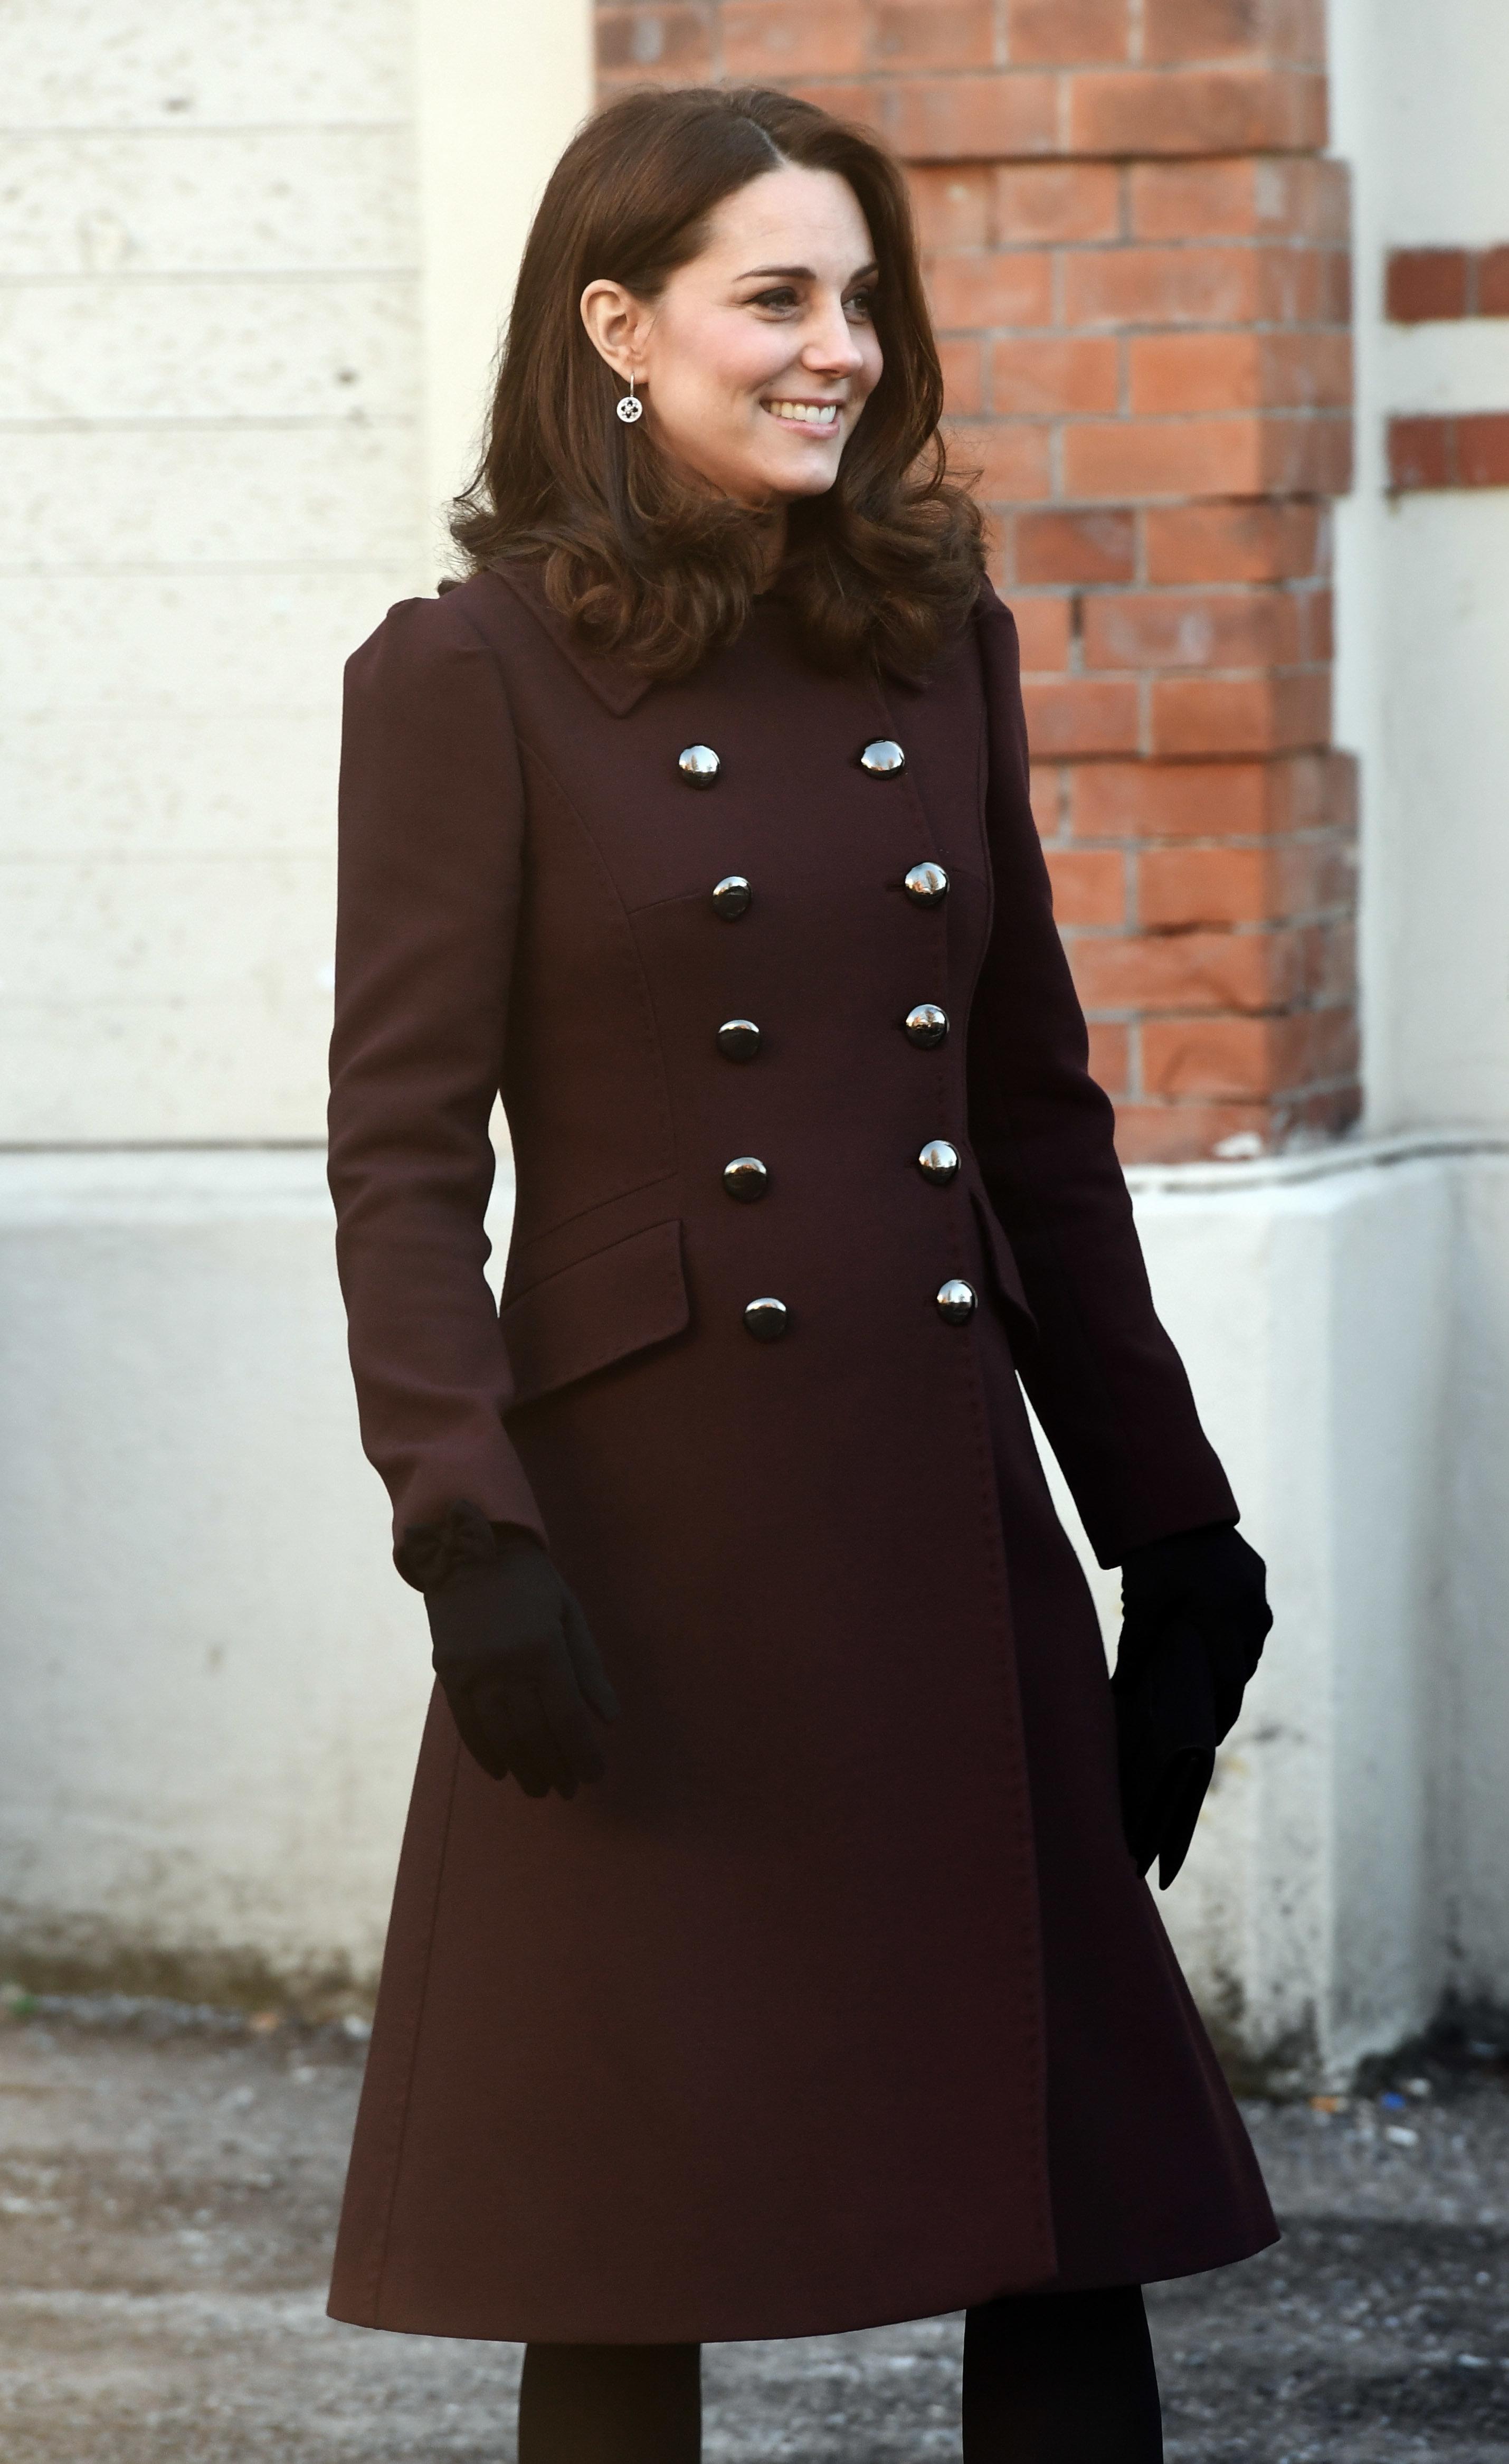 "The duchess wore this<a href=""https://www.popsugar.com/fashion/Kate-Middleton-Dolce-Gabbana-Coat-Norway-Feb-2018-445495"